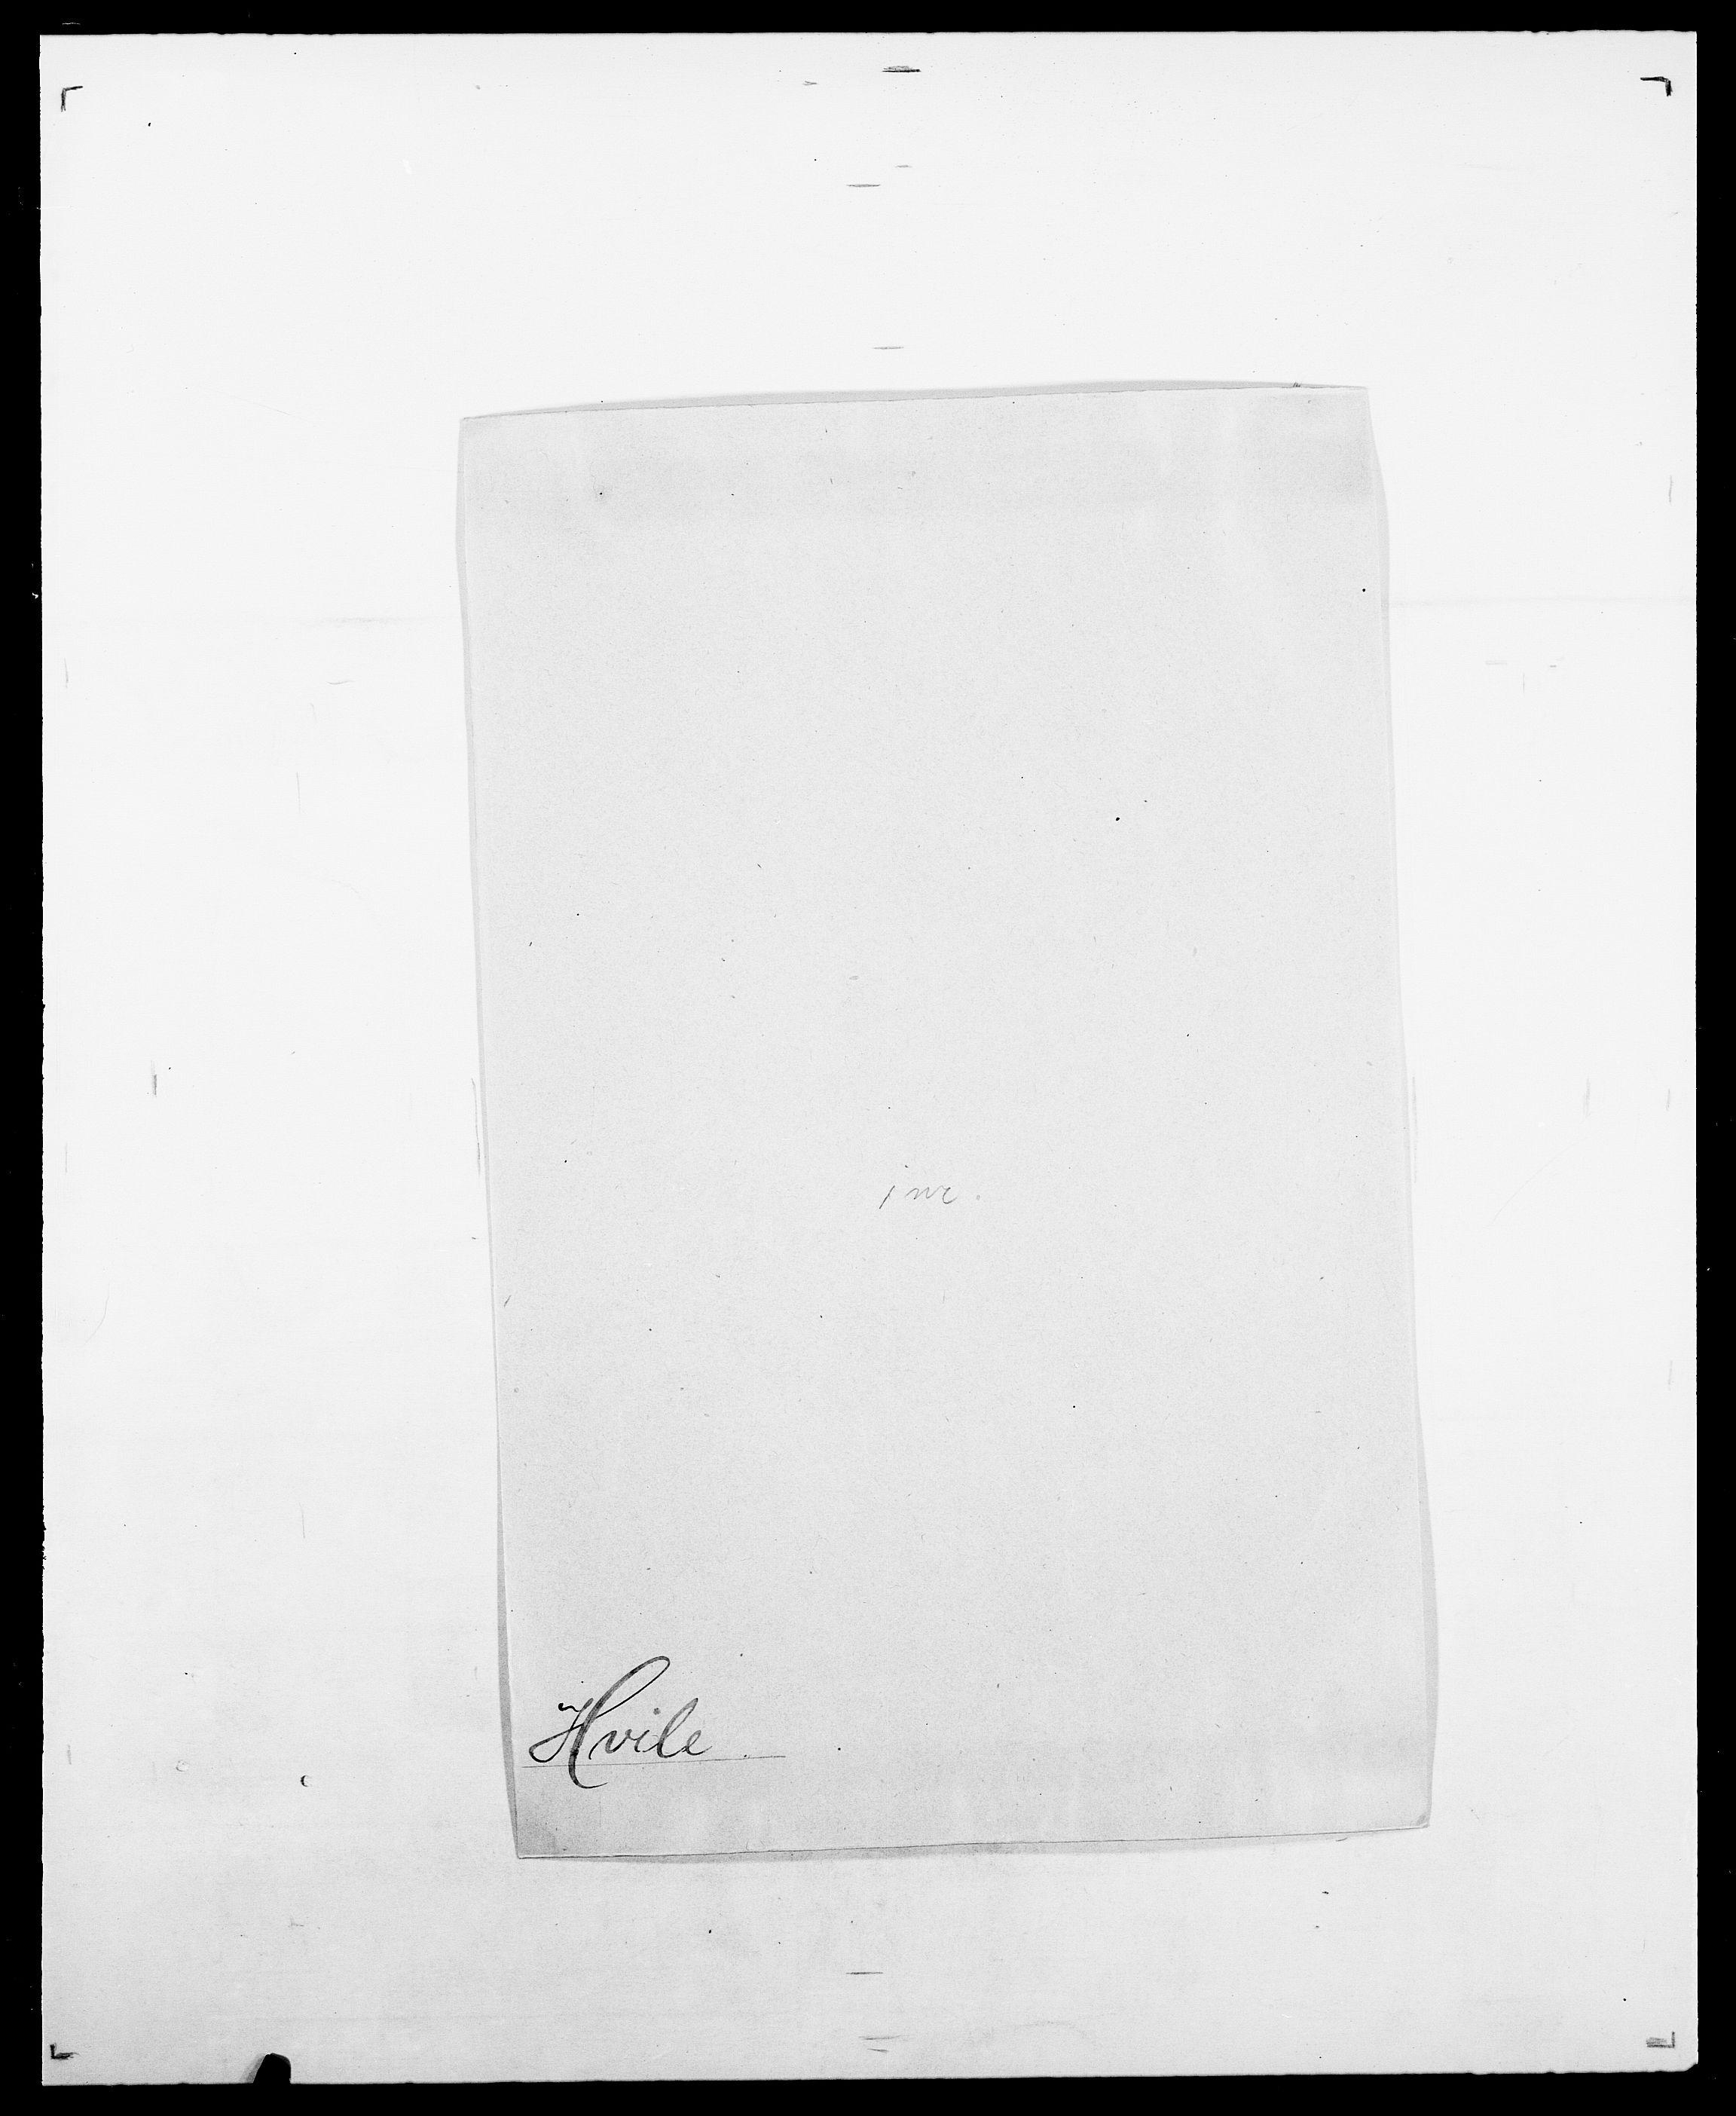 SAO, Delgobe, Charles Antoine - samling, D/Da/L0019: van der Hude - Joys, s. 193